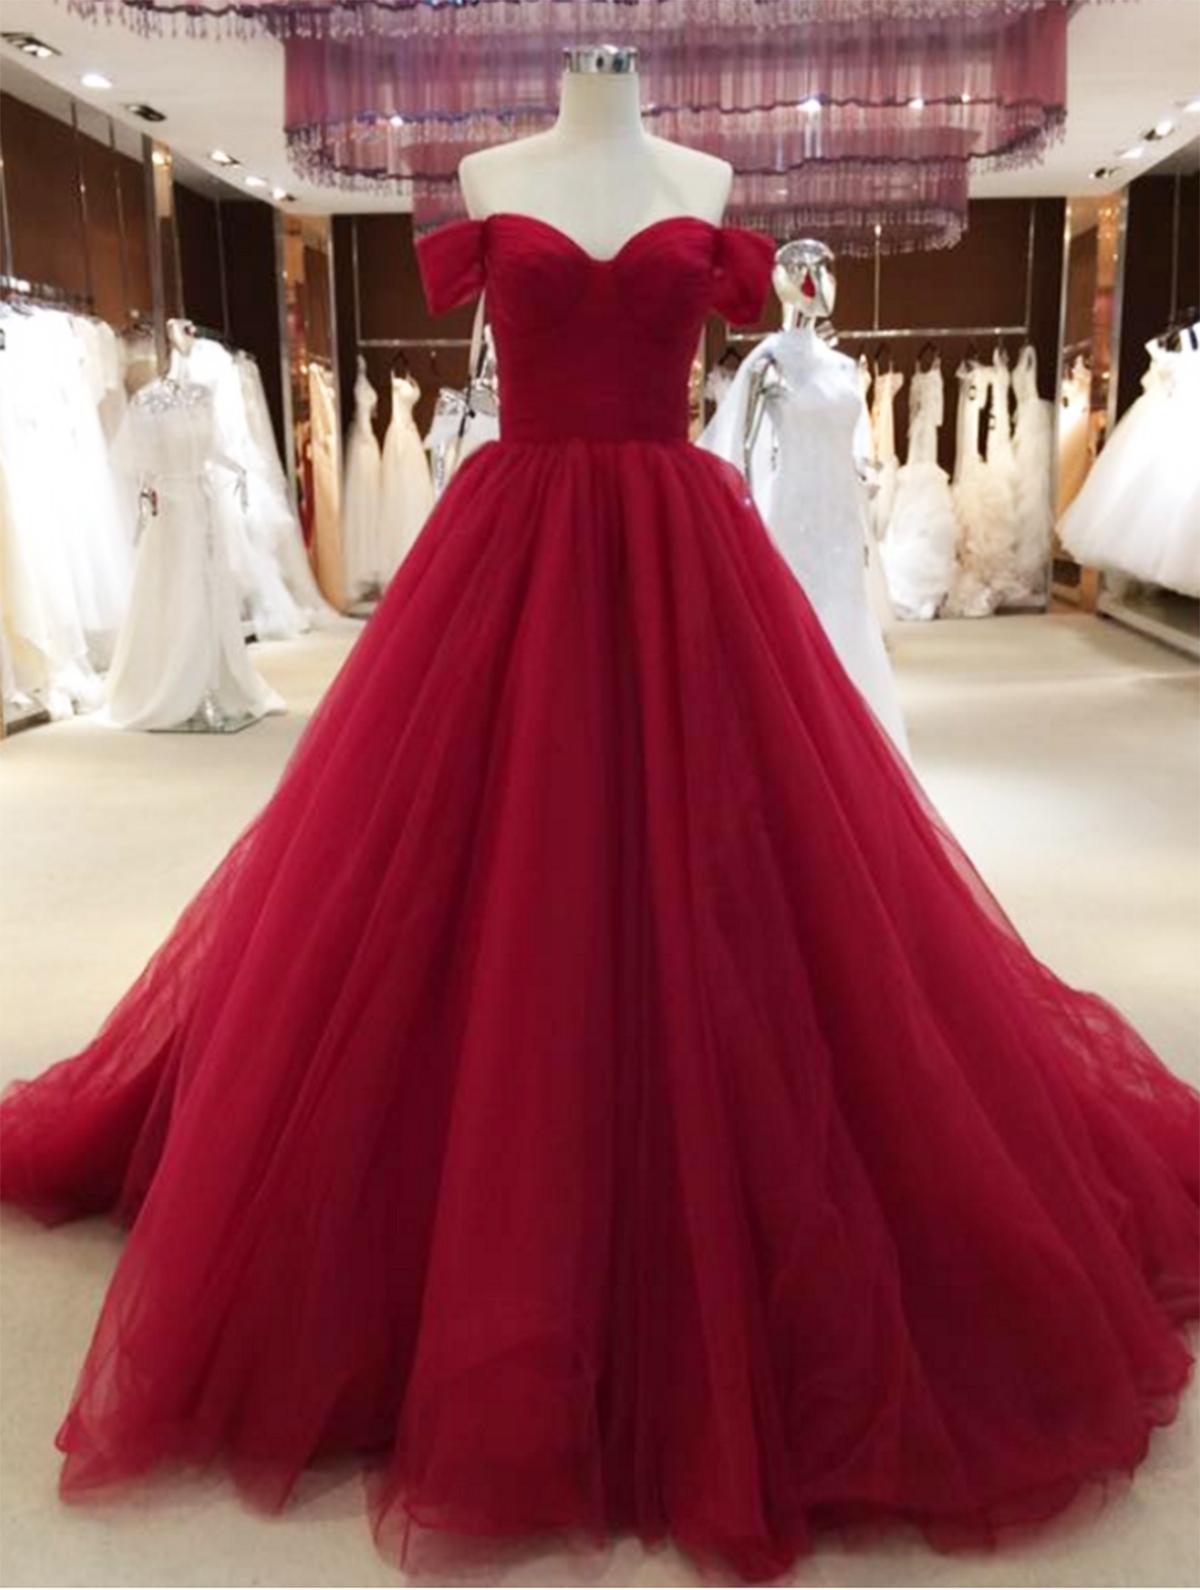 Sweetheart Neckline Evening Gowns